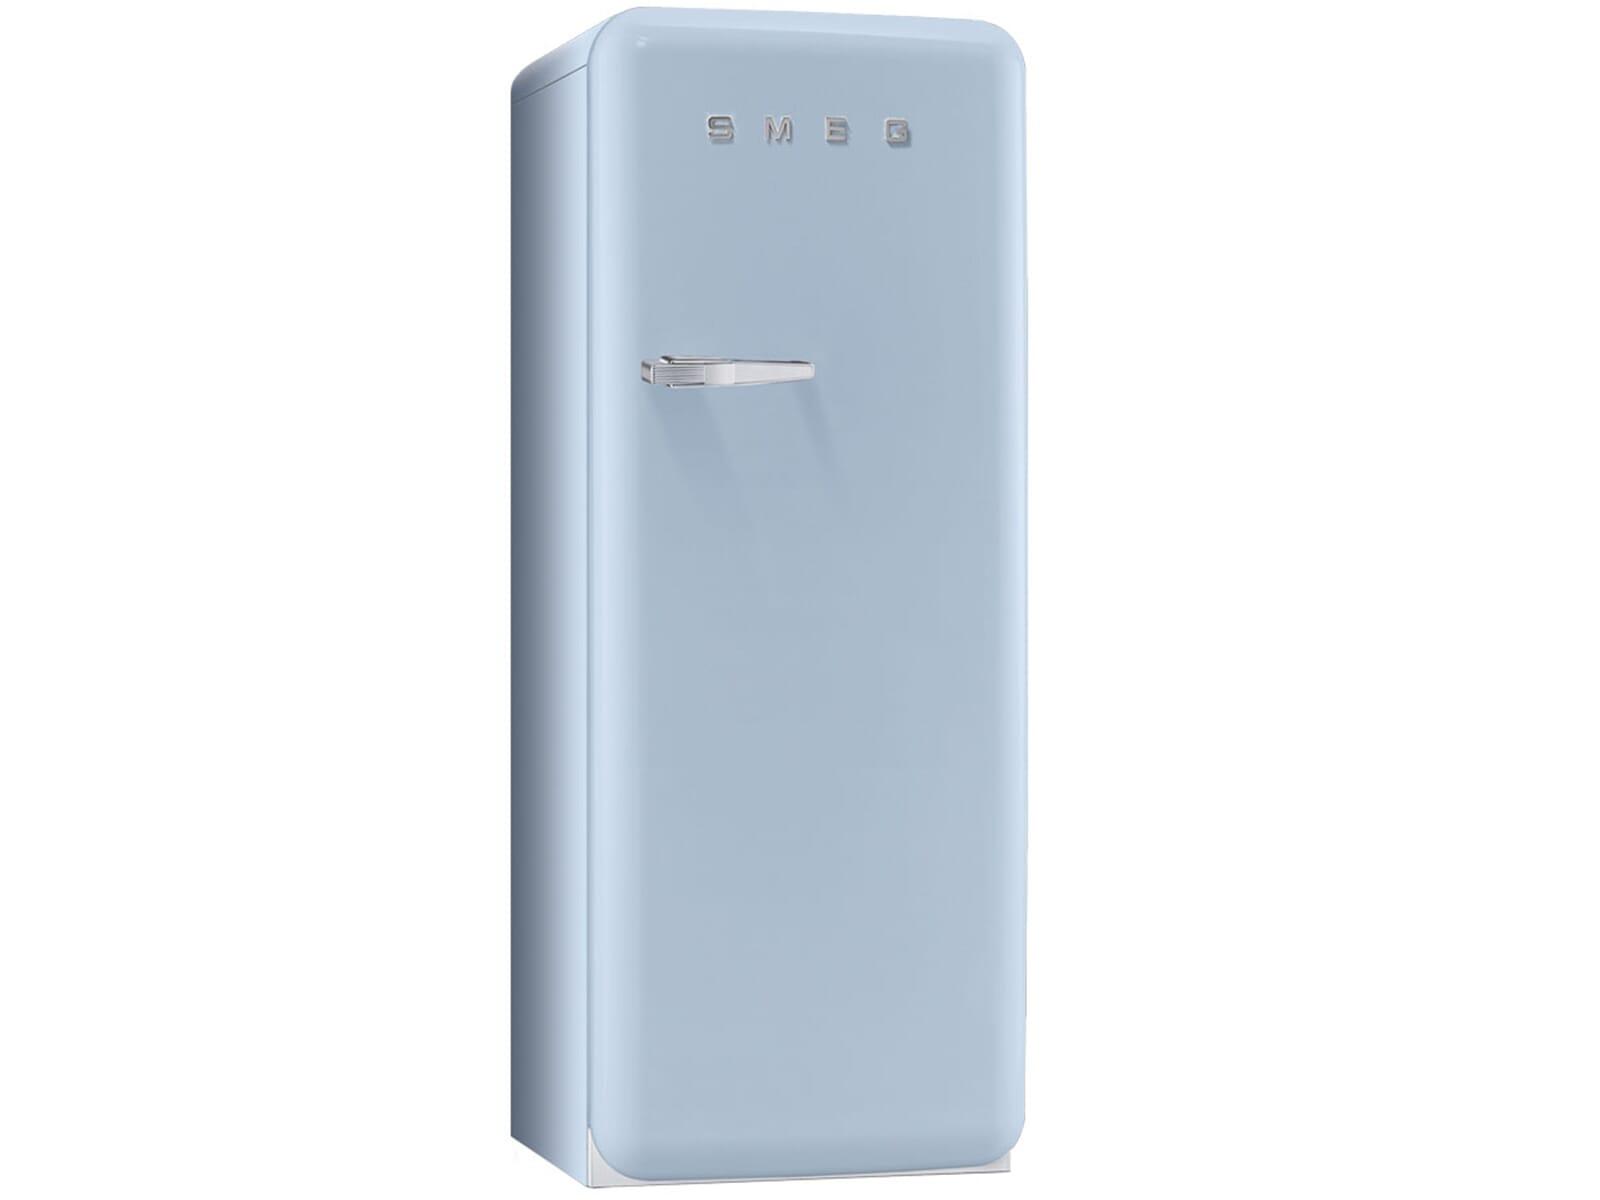 Kühlschrank Von Smeg : Smeg kühlschrank günstig smeg scd imx kombi standherd